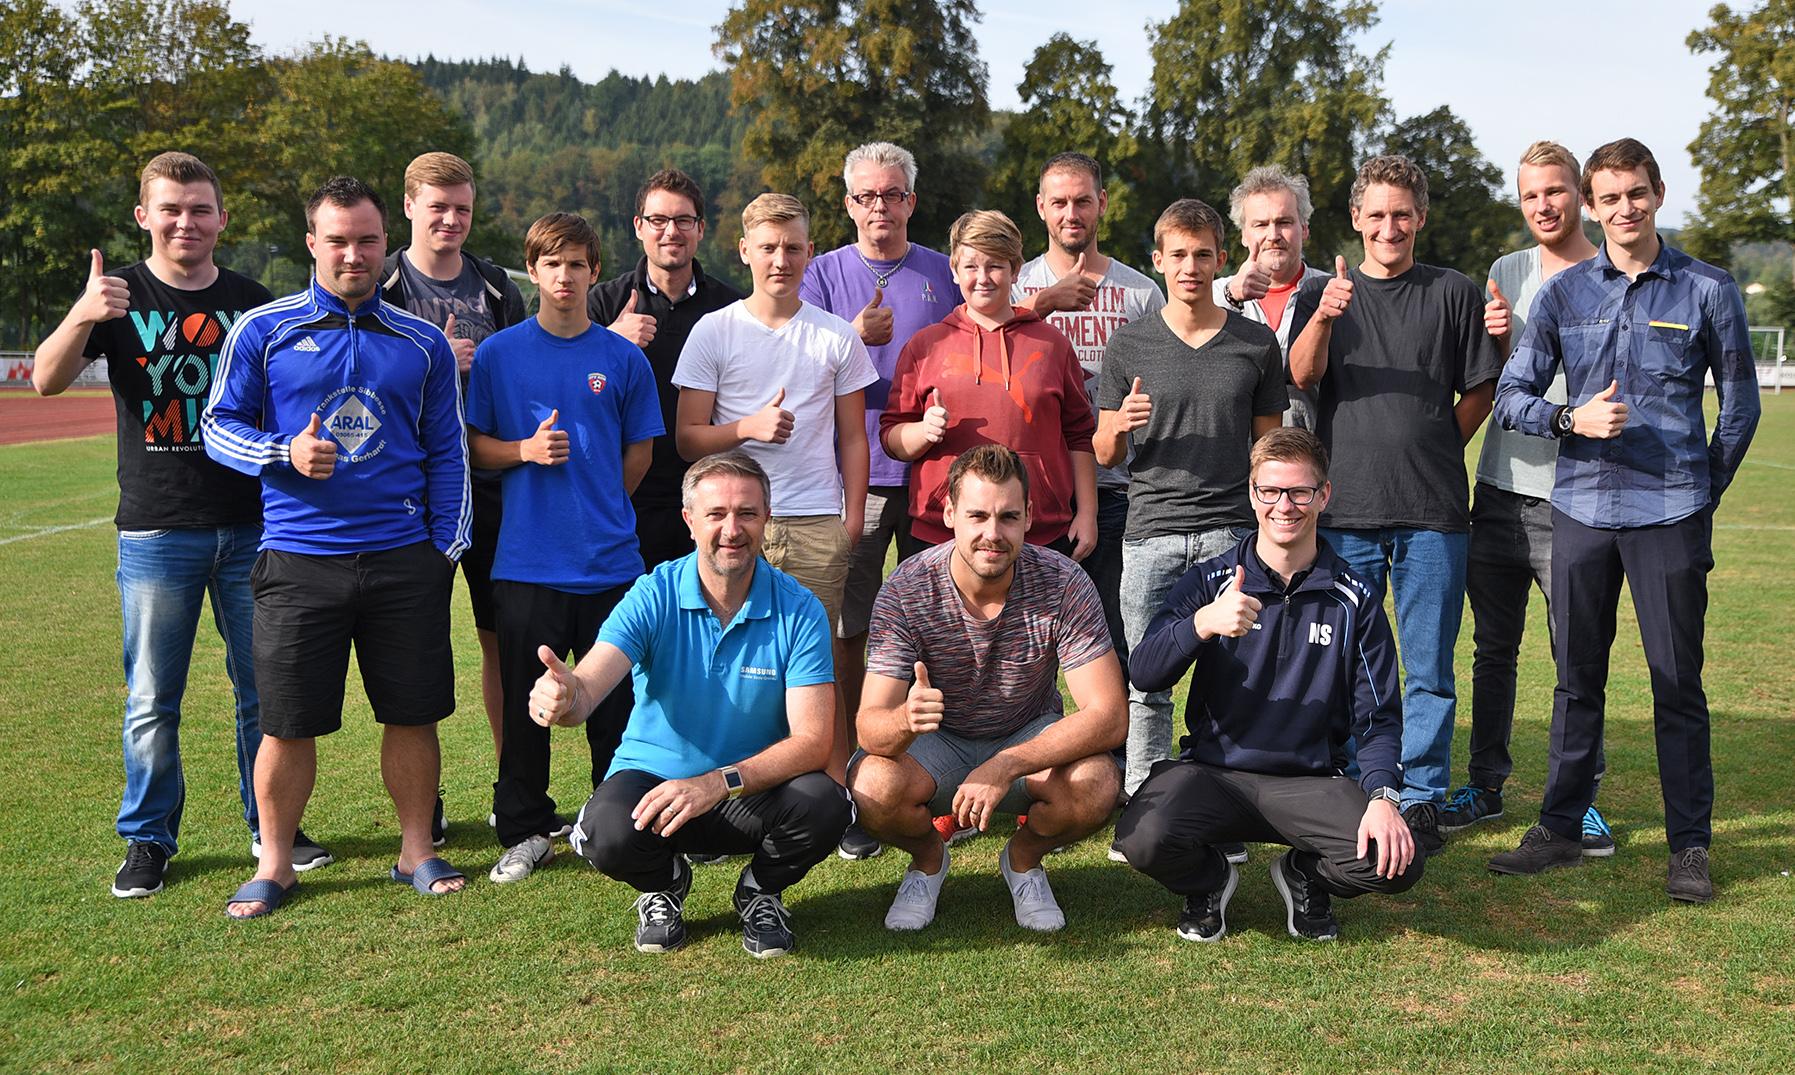 14 neue Schiedsrichter, 2016 in Alfeld